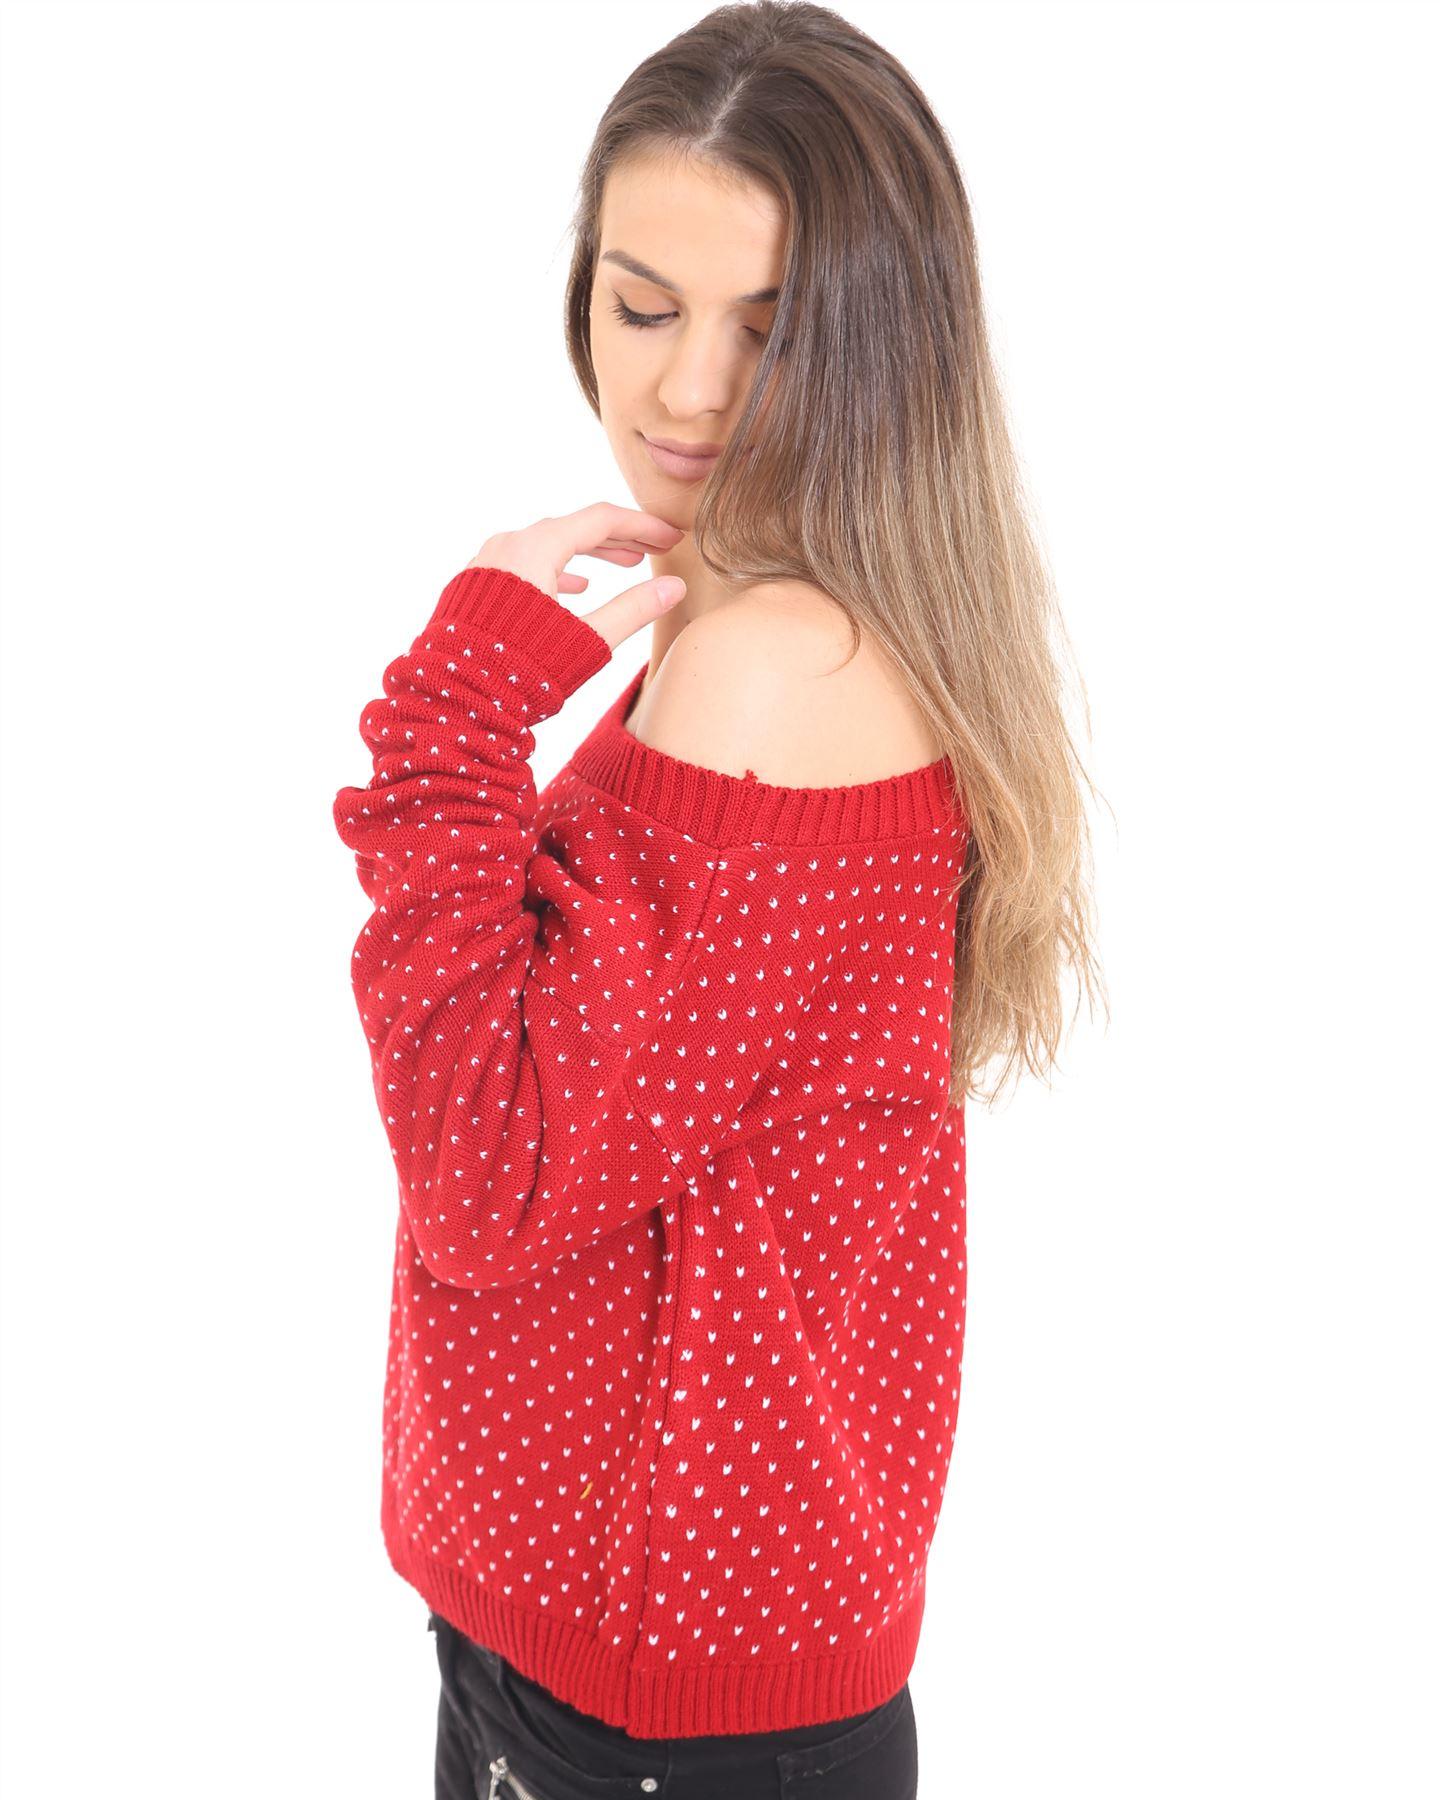 Ladies Women Knitted Long Sleeve OverSize Christmas Xmas Jumper Crop Top Sweater